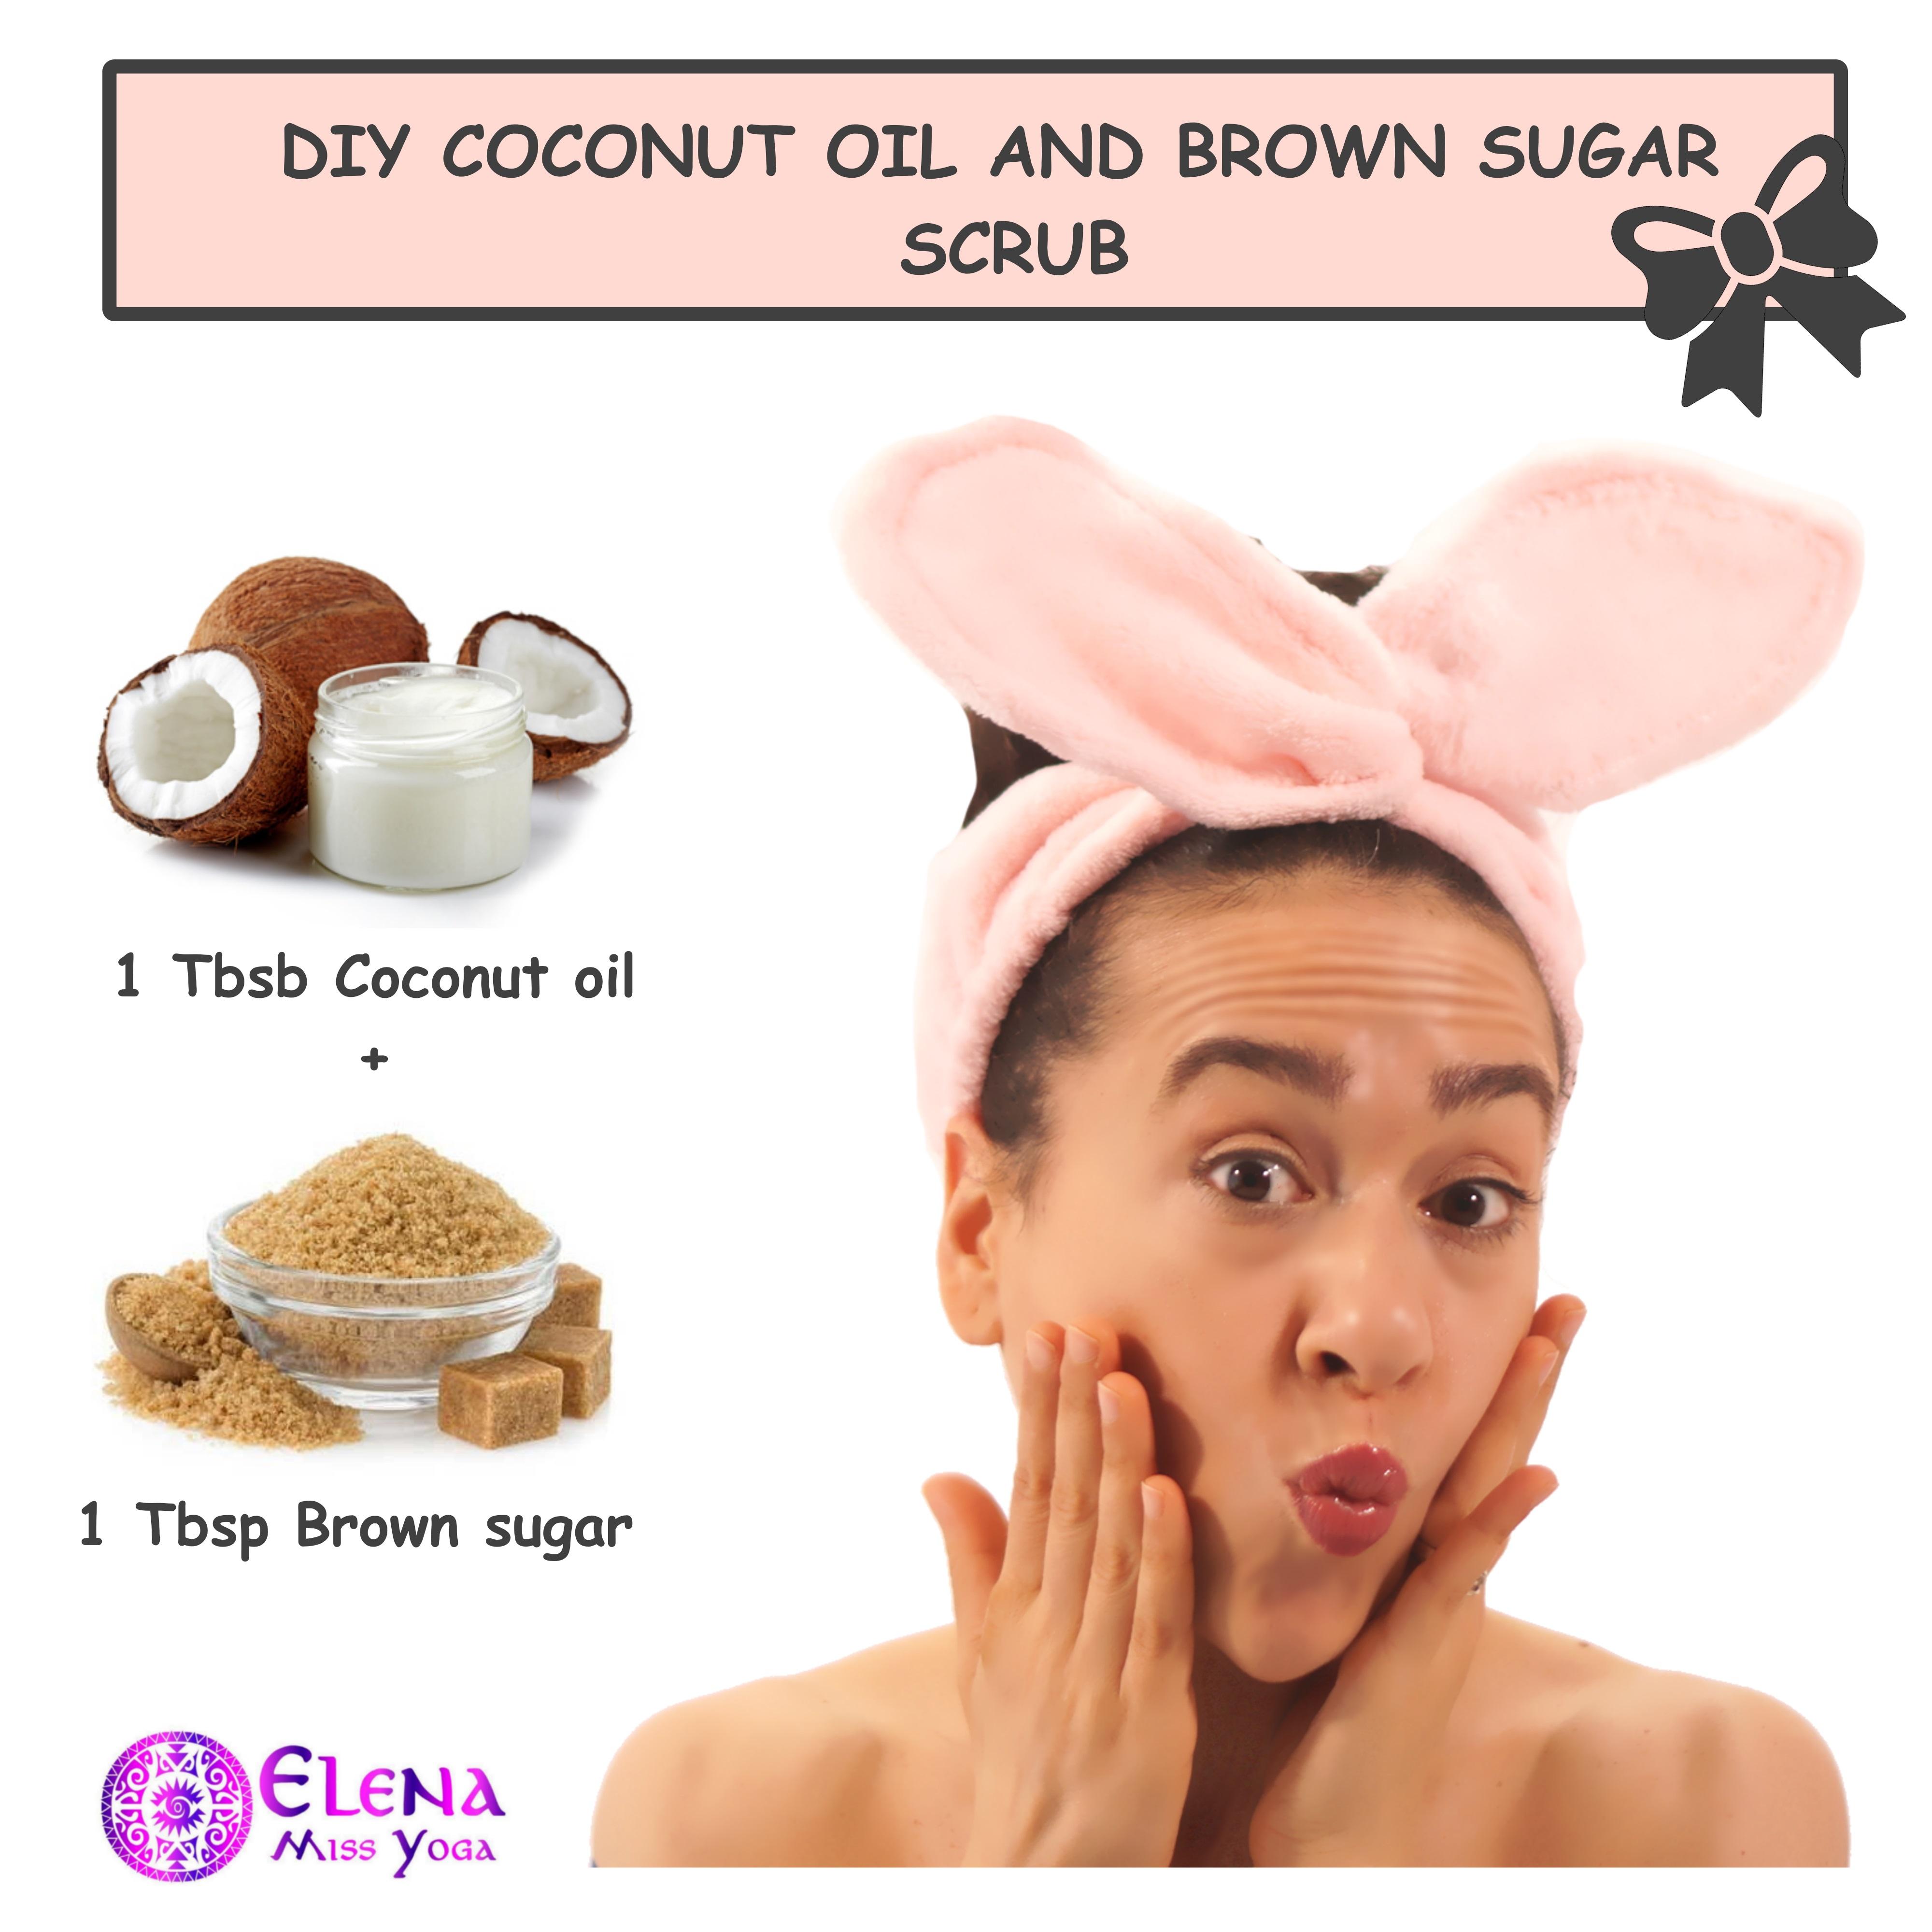 DIY COCONUT OIL AND BROWN SUGAR SCRUB